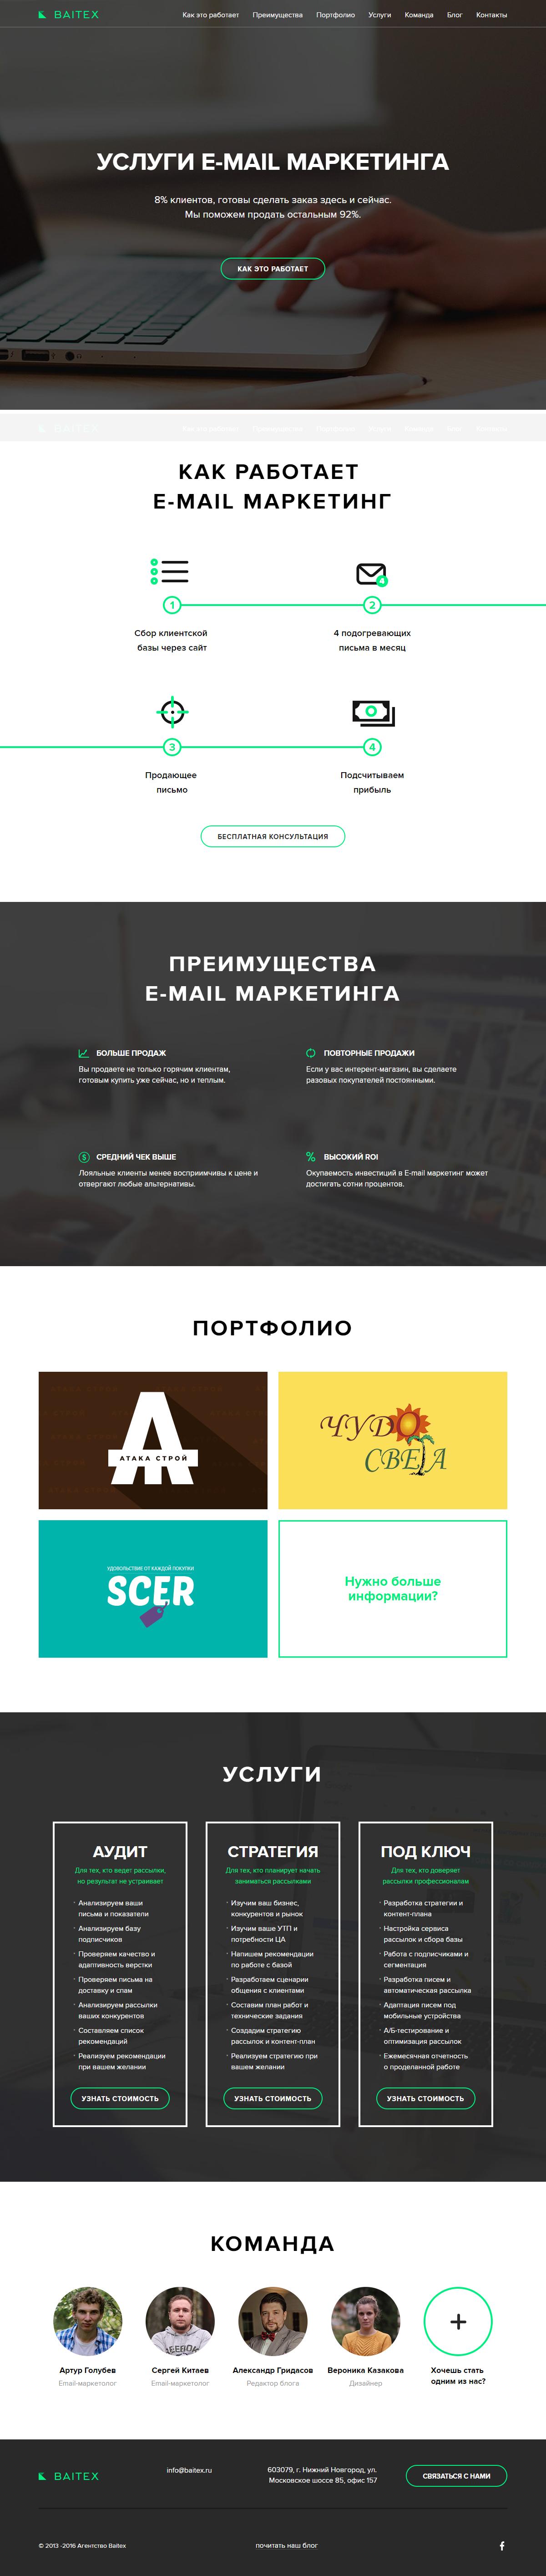 Корпоративный сайт агентства Email-маркетинга «Baitex»